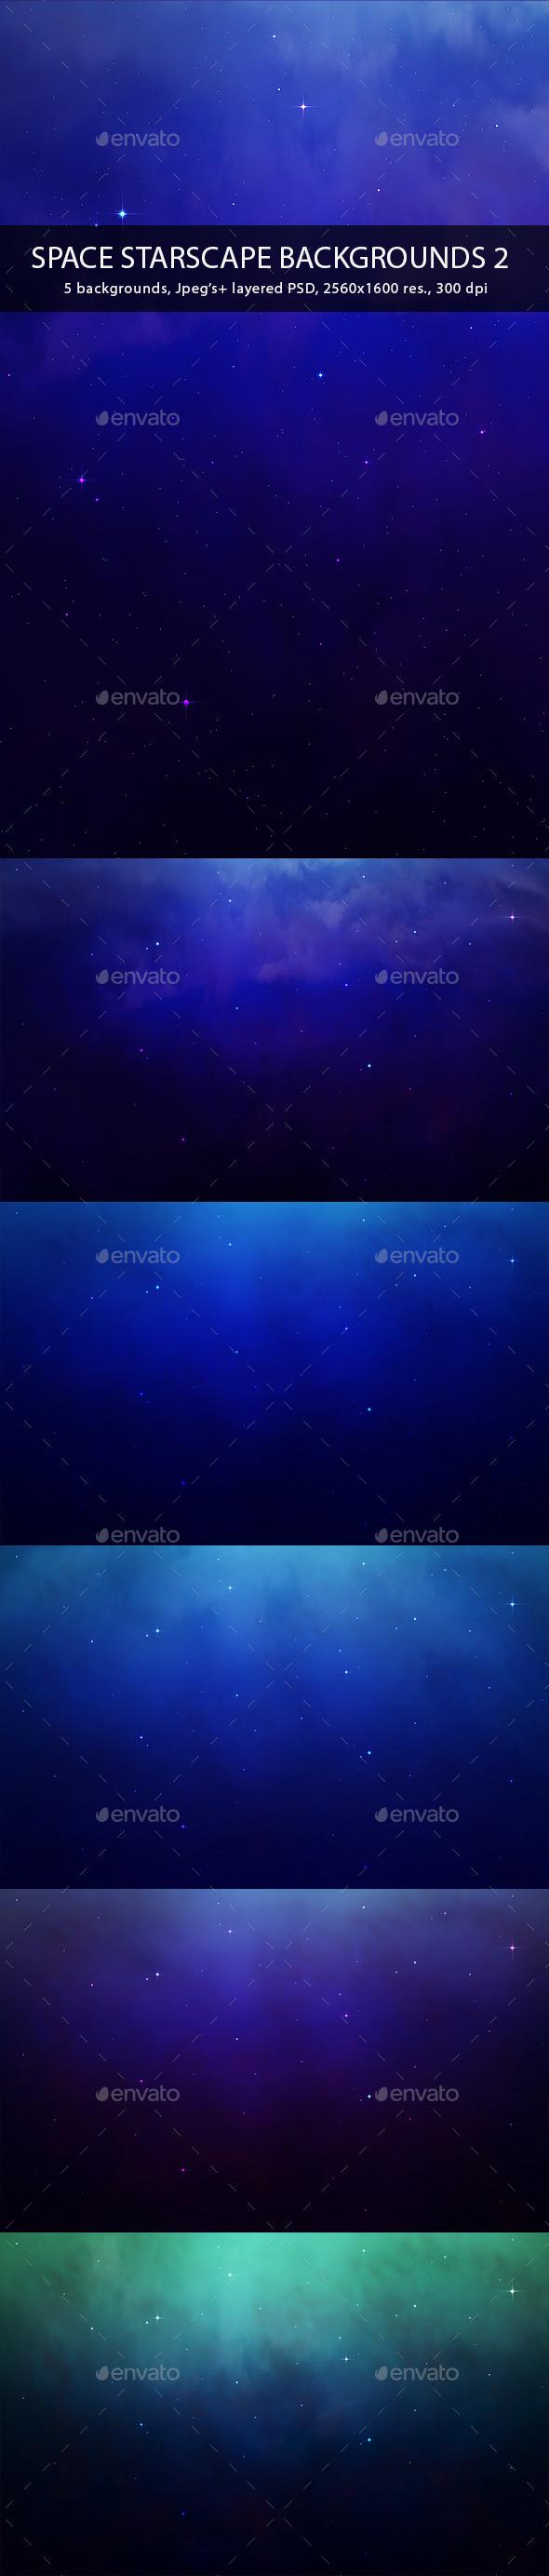 Space Starscape Backgrounds 2 - Tech / Futuristic Backgrounds